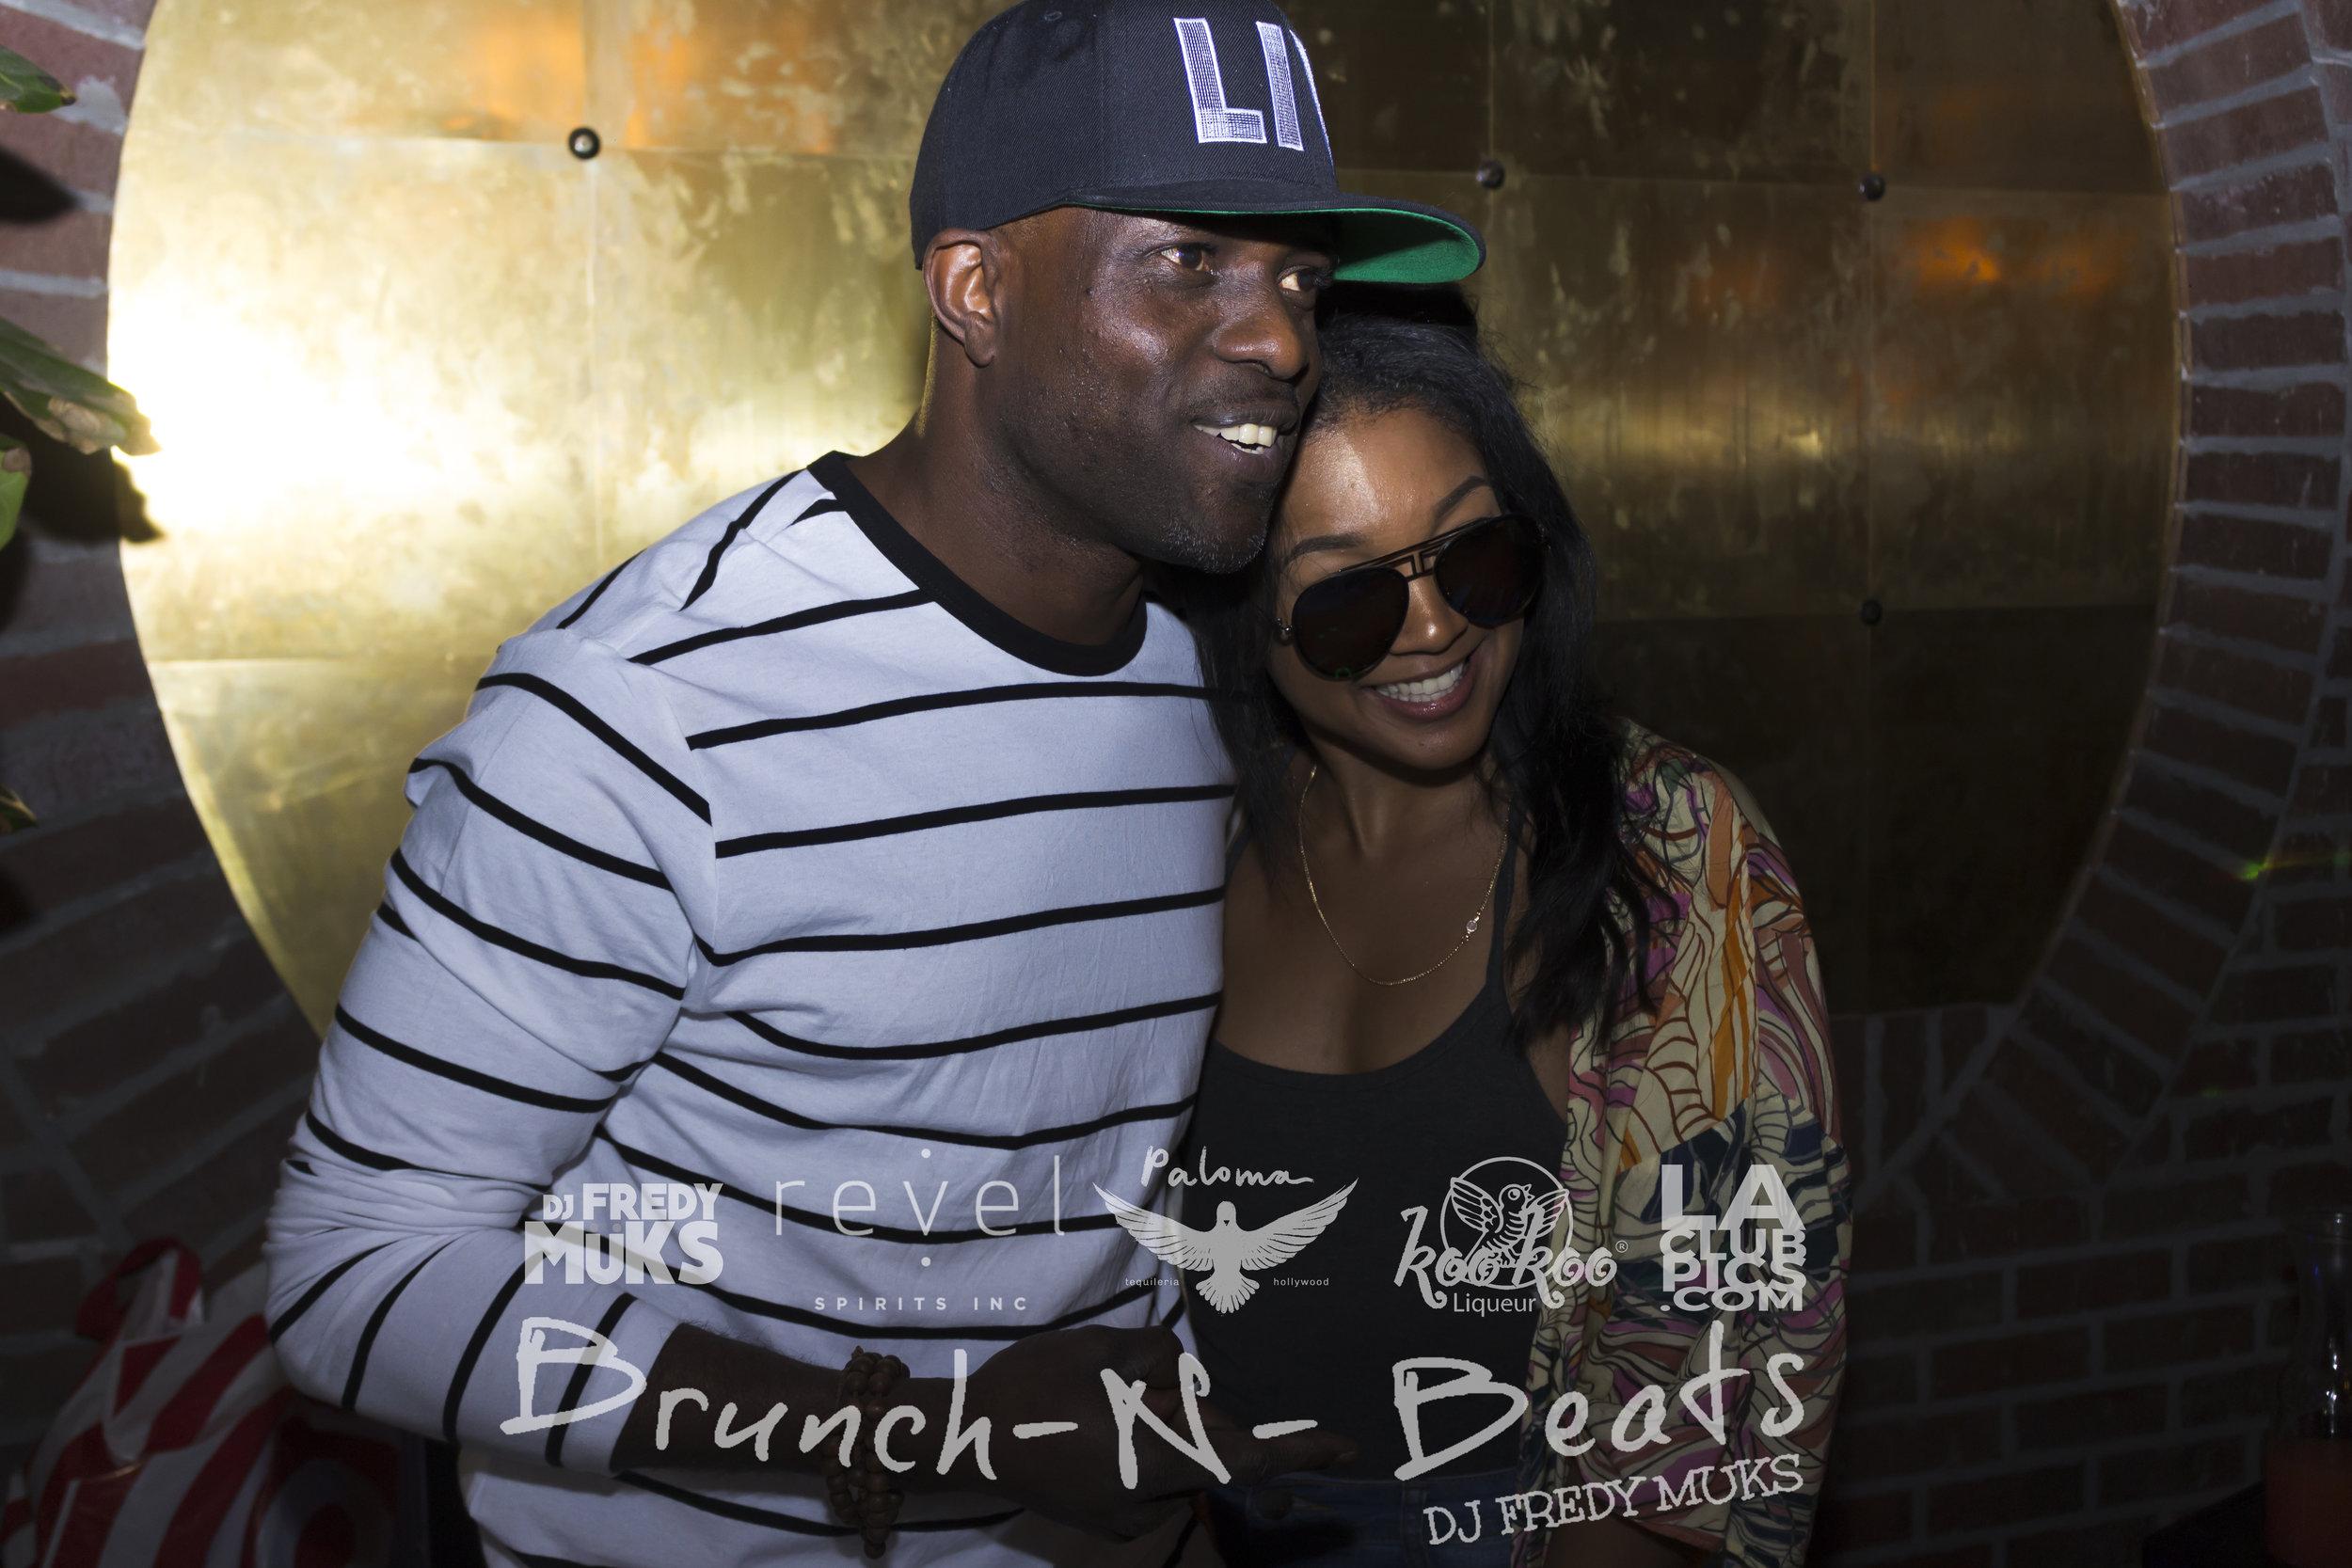 Brunch-N-Beats - Paloma Hollywood - 02-25-18_147.jpg